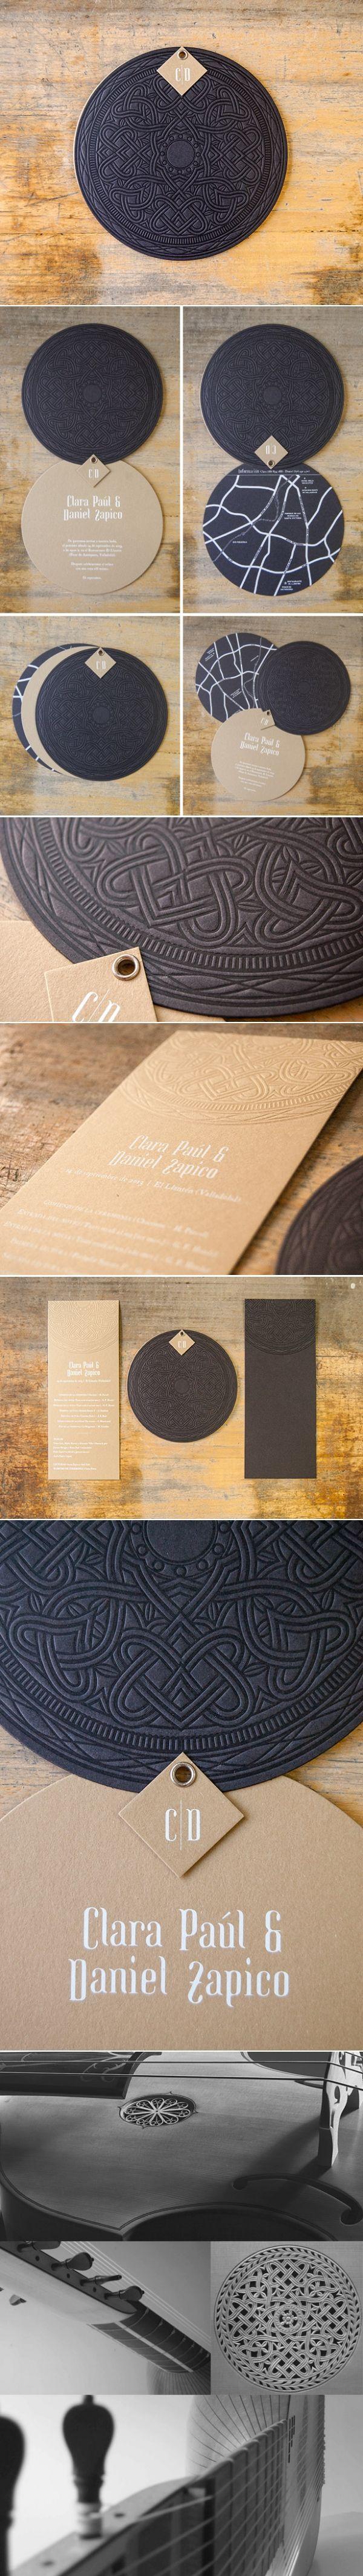 Clara Paul & Daniel Zapico | Printer/Designer: El Calotipo #printdesign #collateral #identity                                                                                                                                                     Mehr